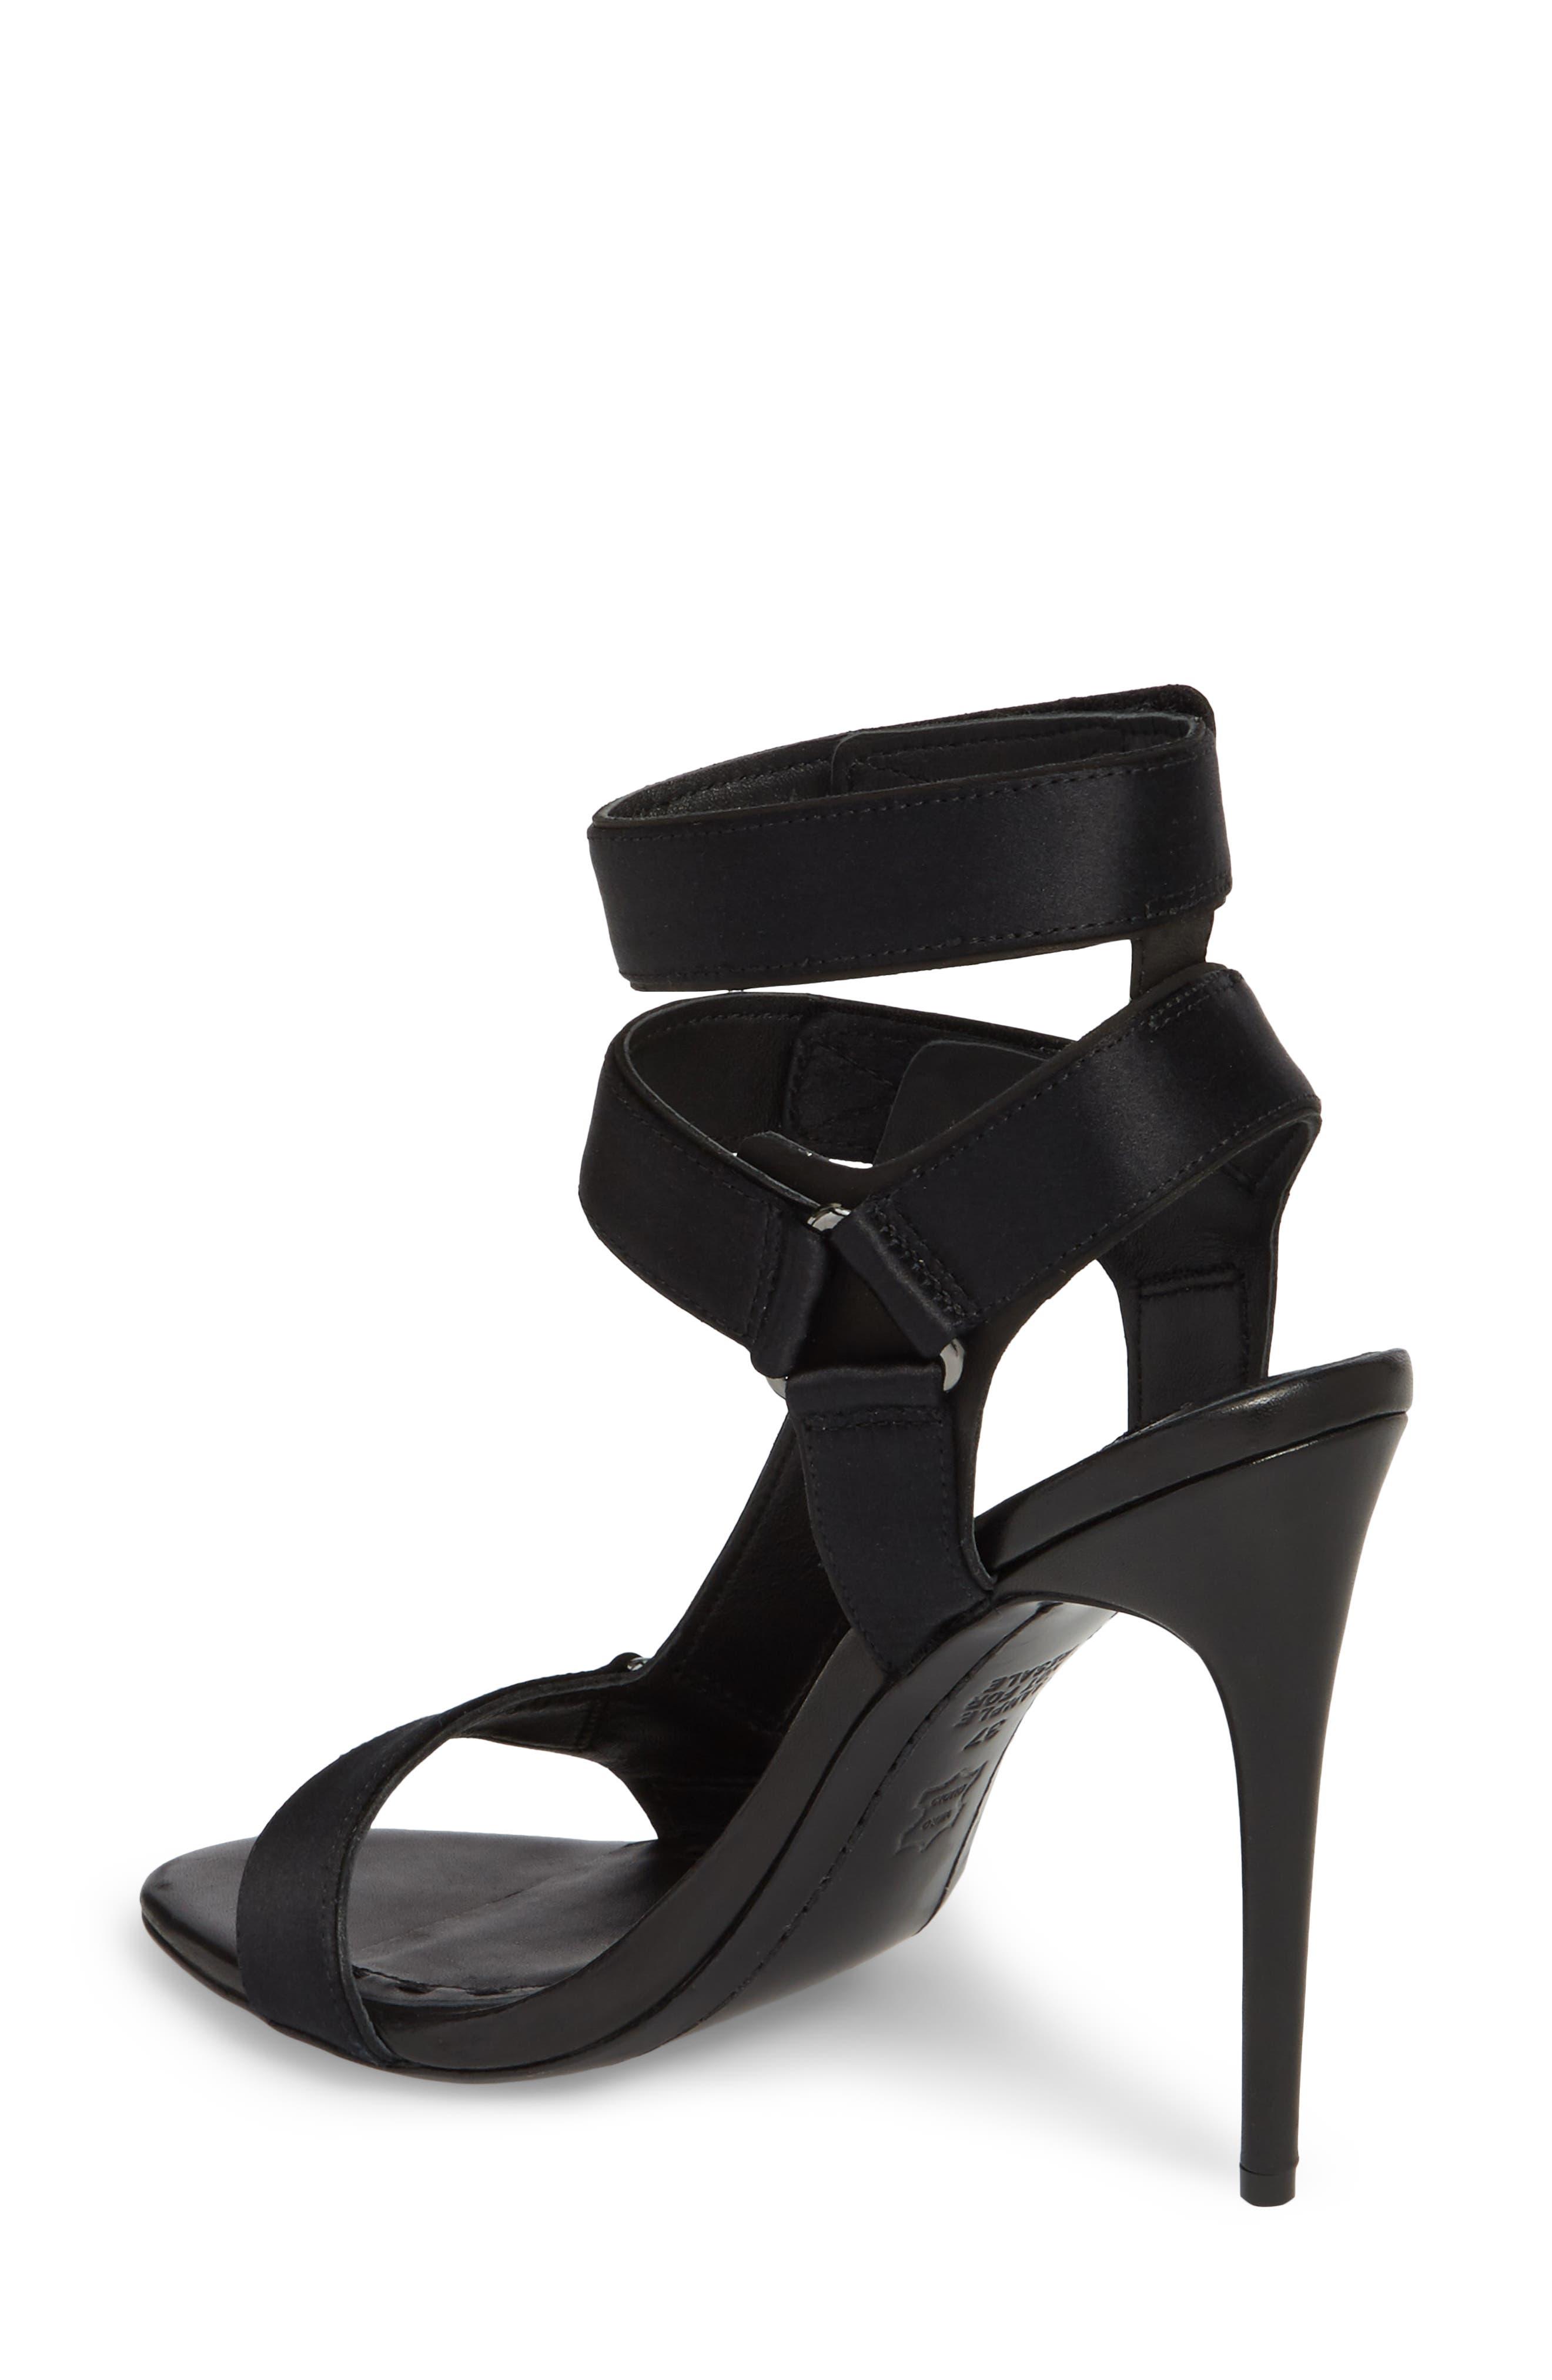 Tamryn Studded Ankle Strap Sandal,                             Alternate thumbnail 2, color,                             Black